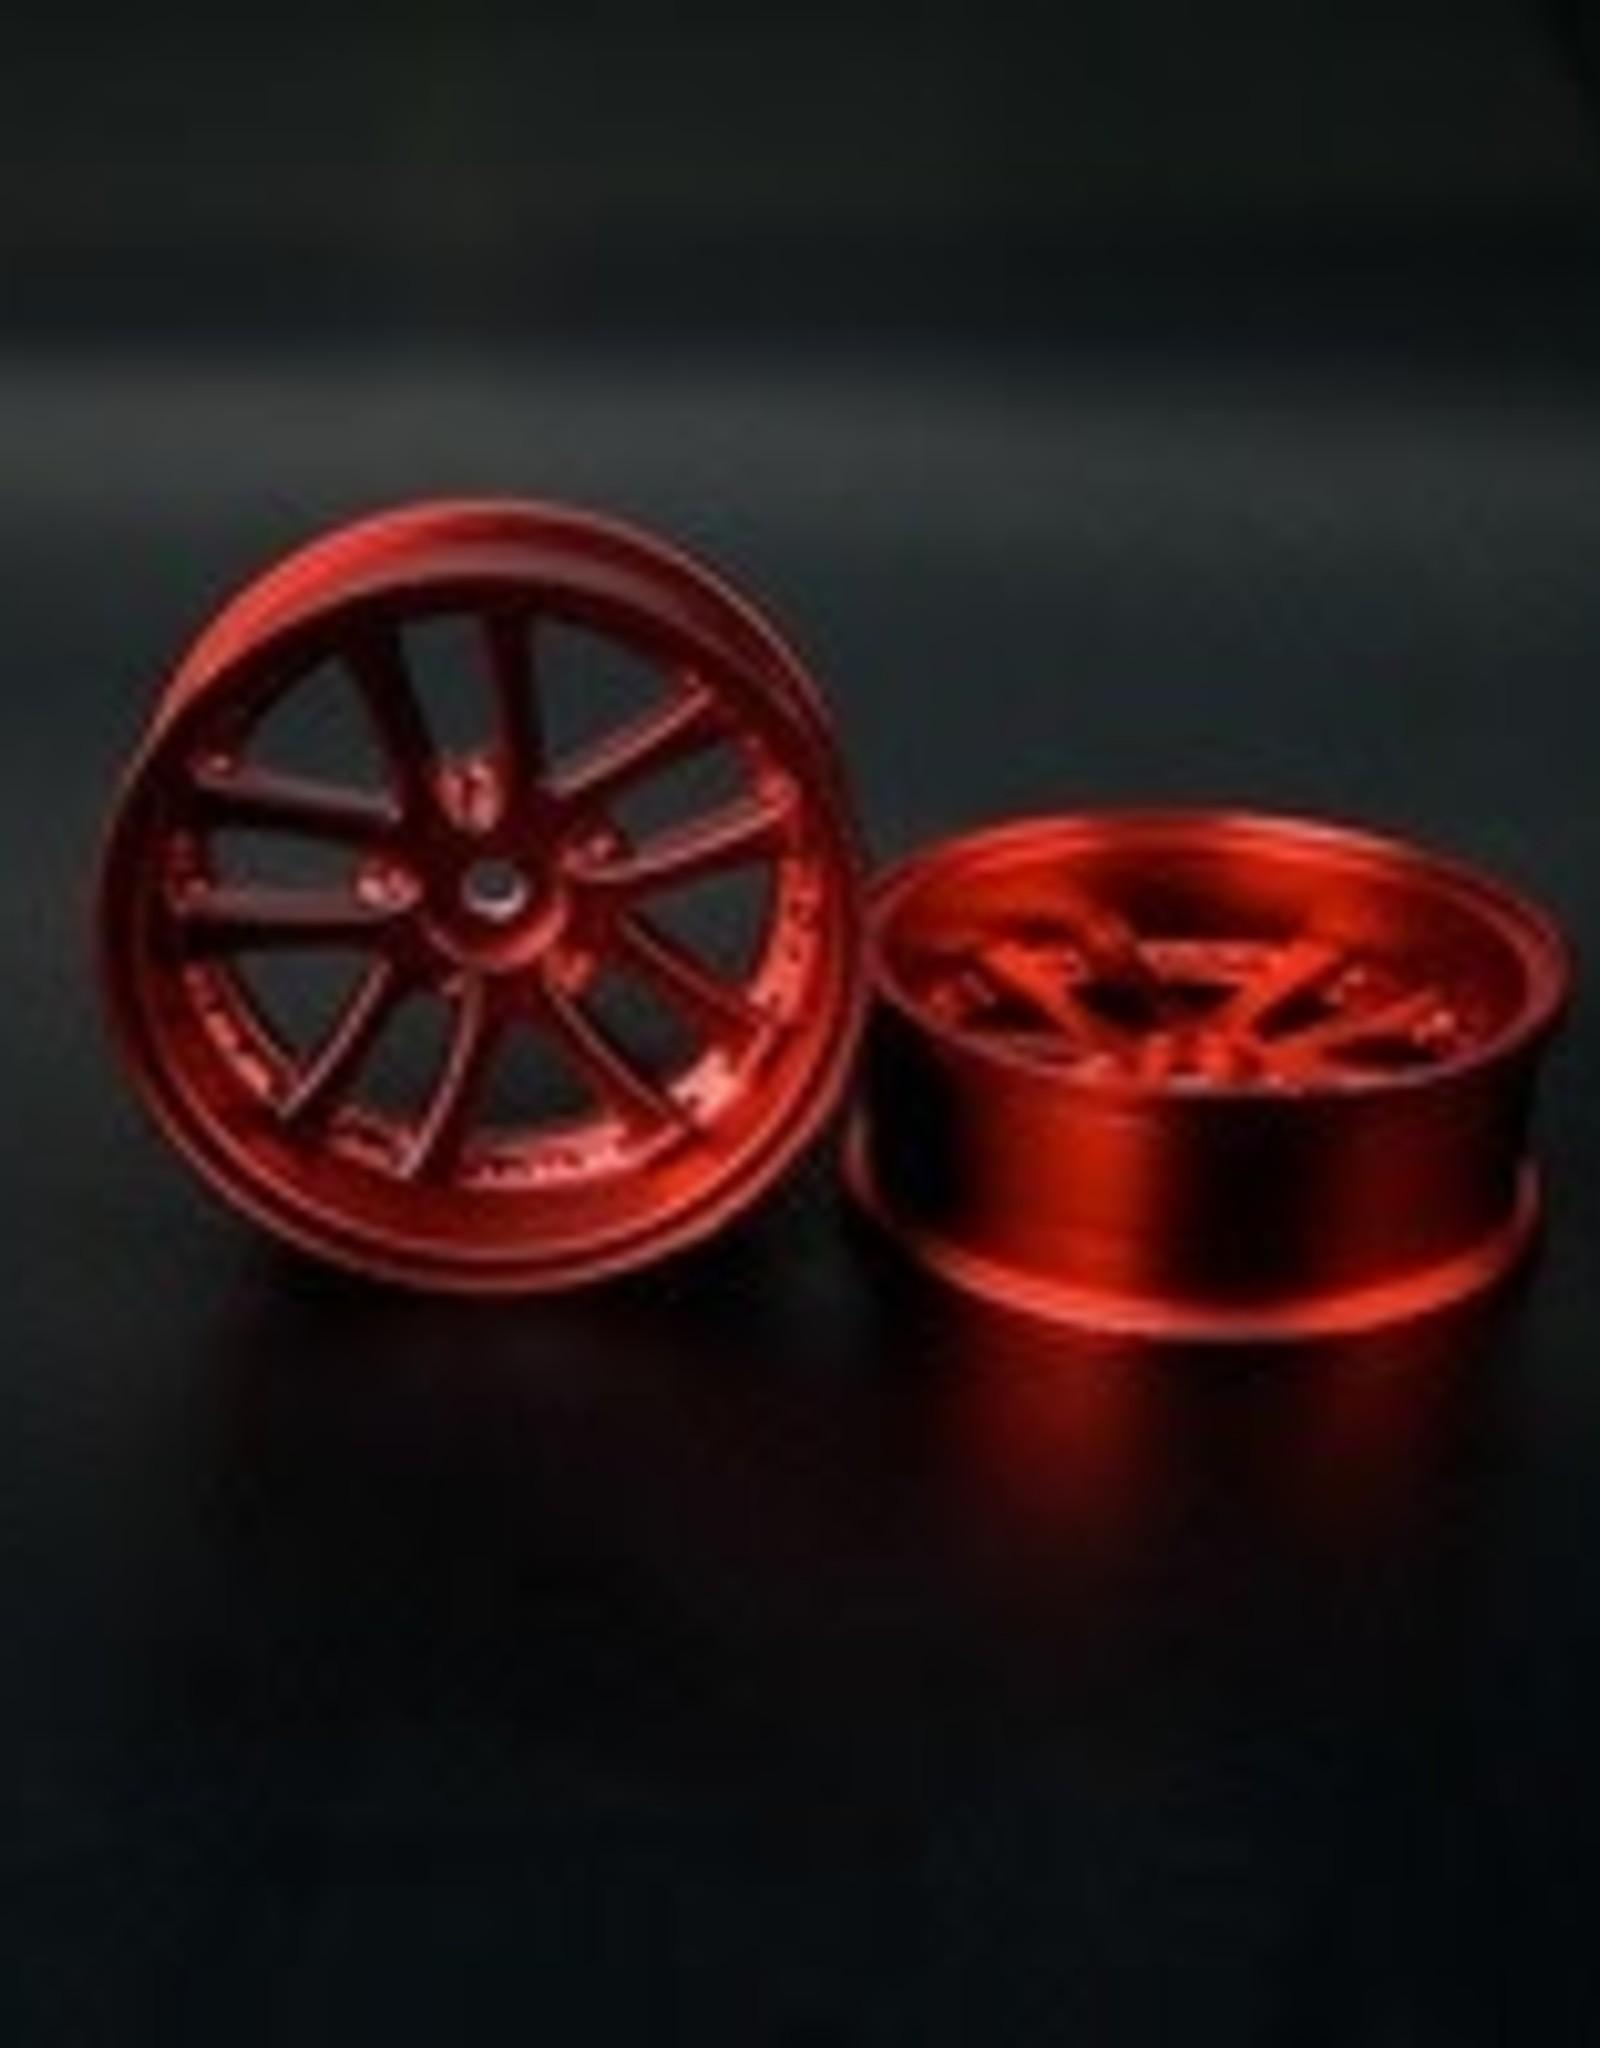 Speedline SL289R8 - LX 10-Spokes Narrow RWD wheels (2) offset-9 52x20mm Chrome Red - Speedline